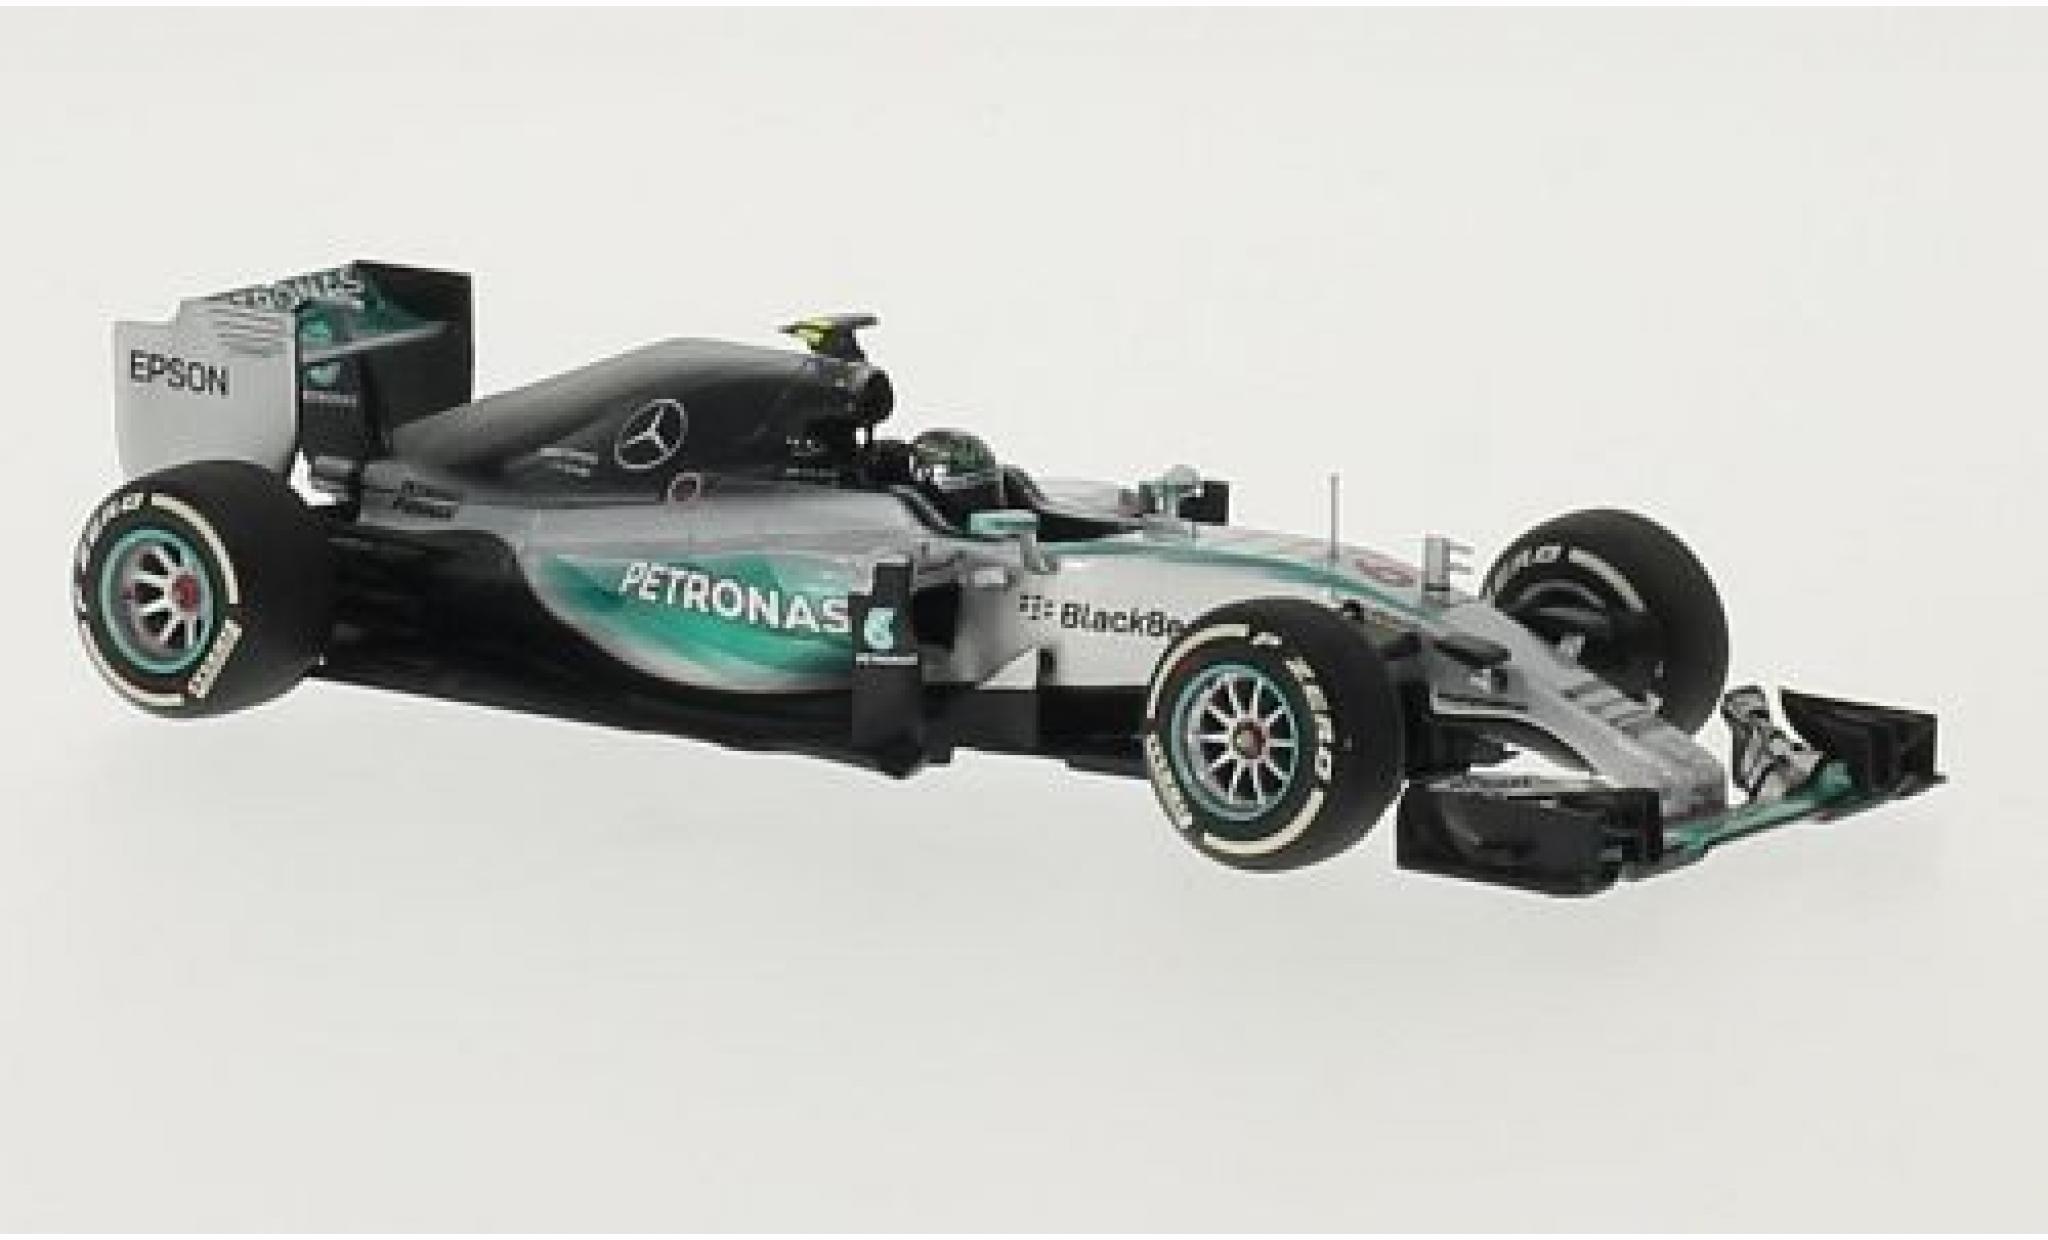 Mercedes F1 1/43 I Minichamps W06 Hybrid No.6 AMG Petronas Formula One Team Petronas Formel 1 -Saison 2015 N.Rosberg